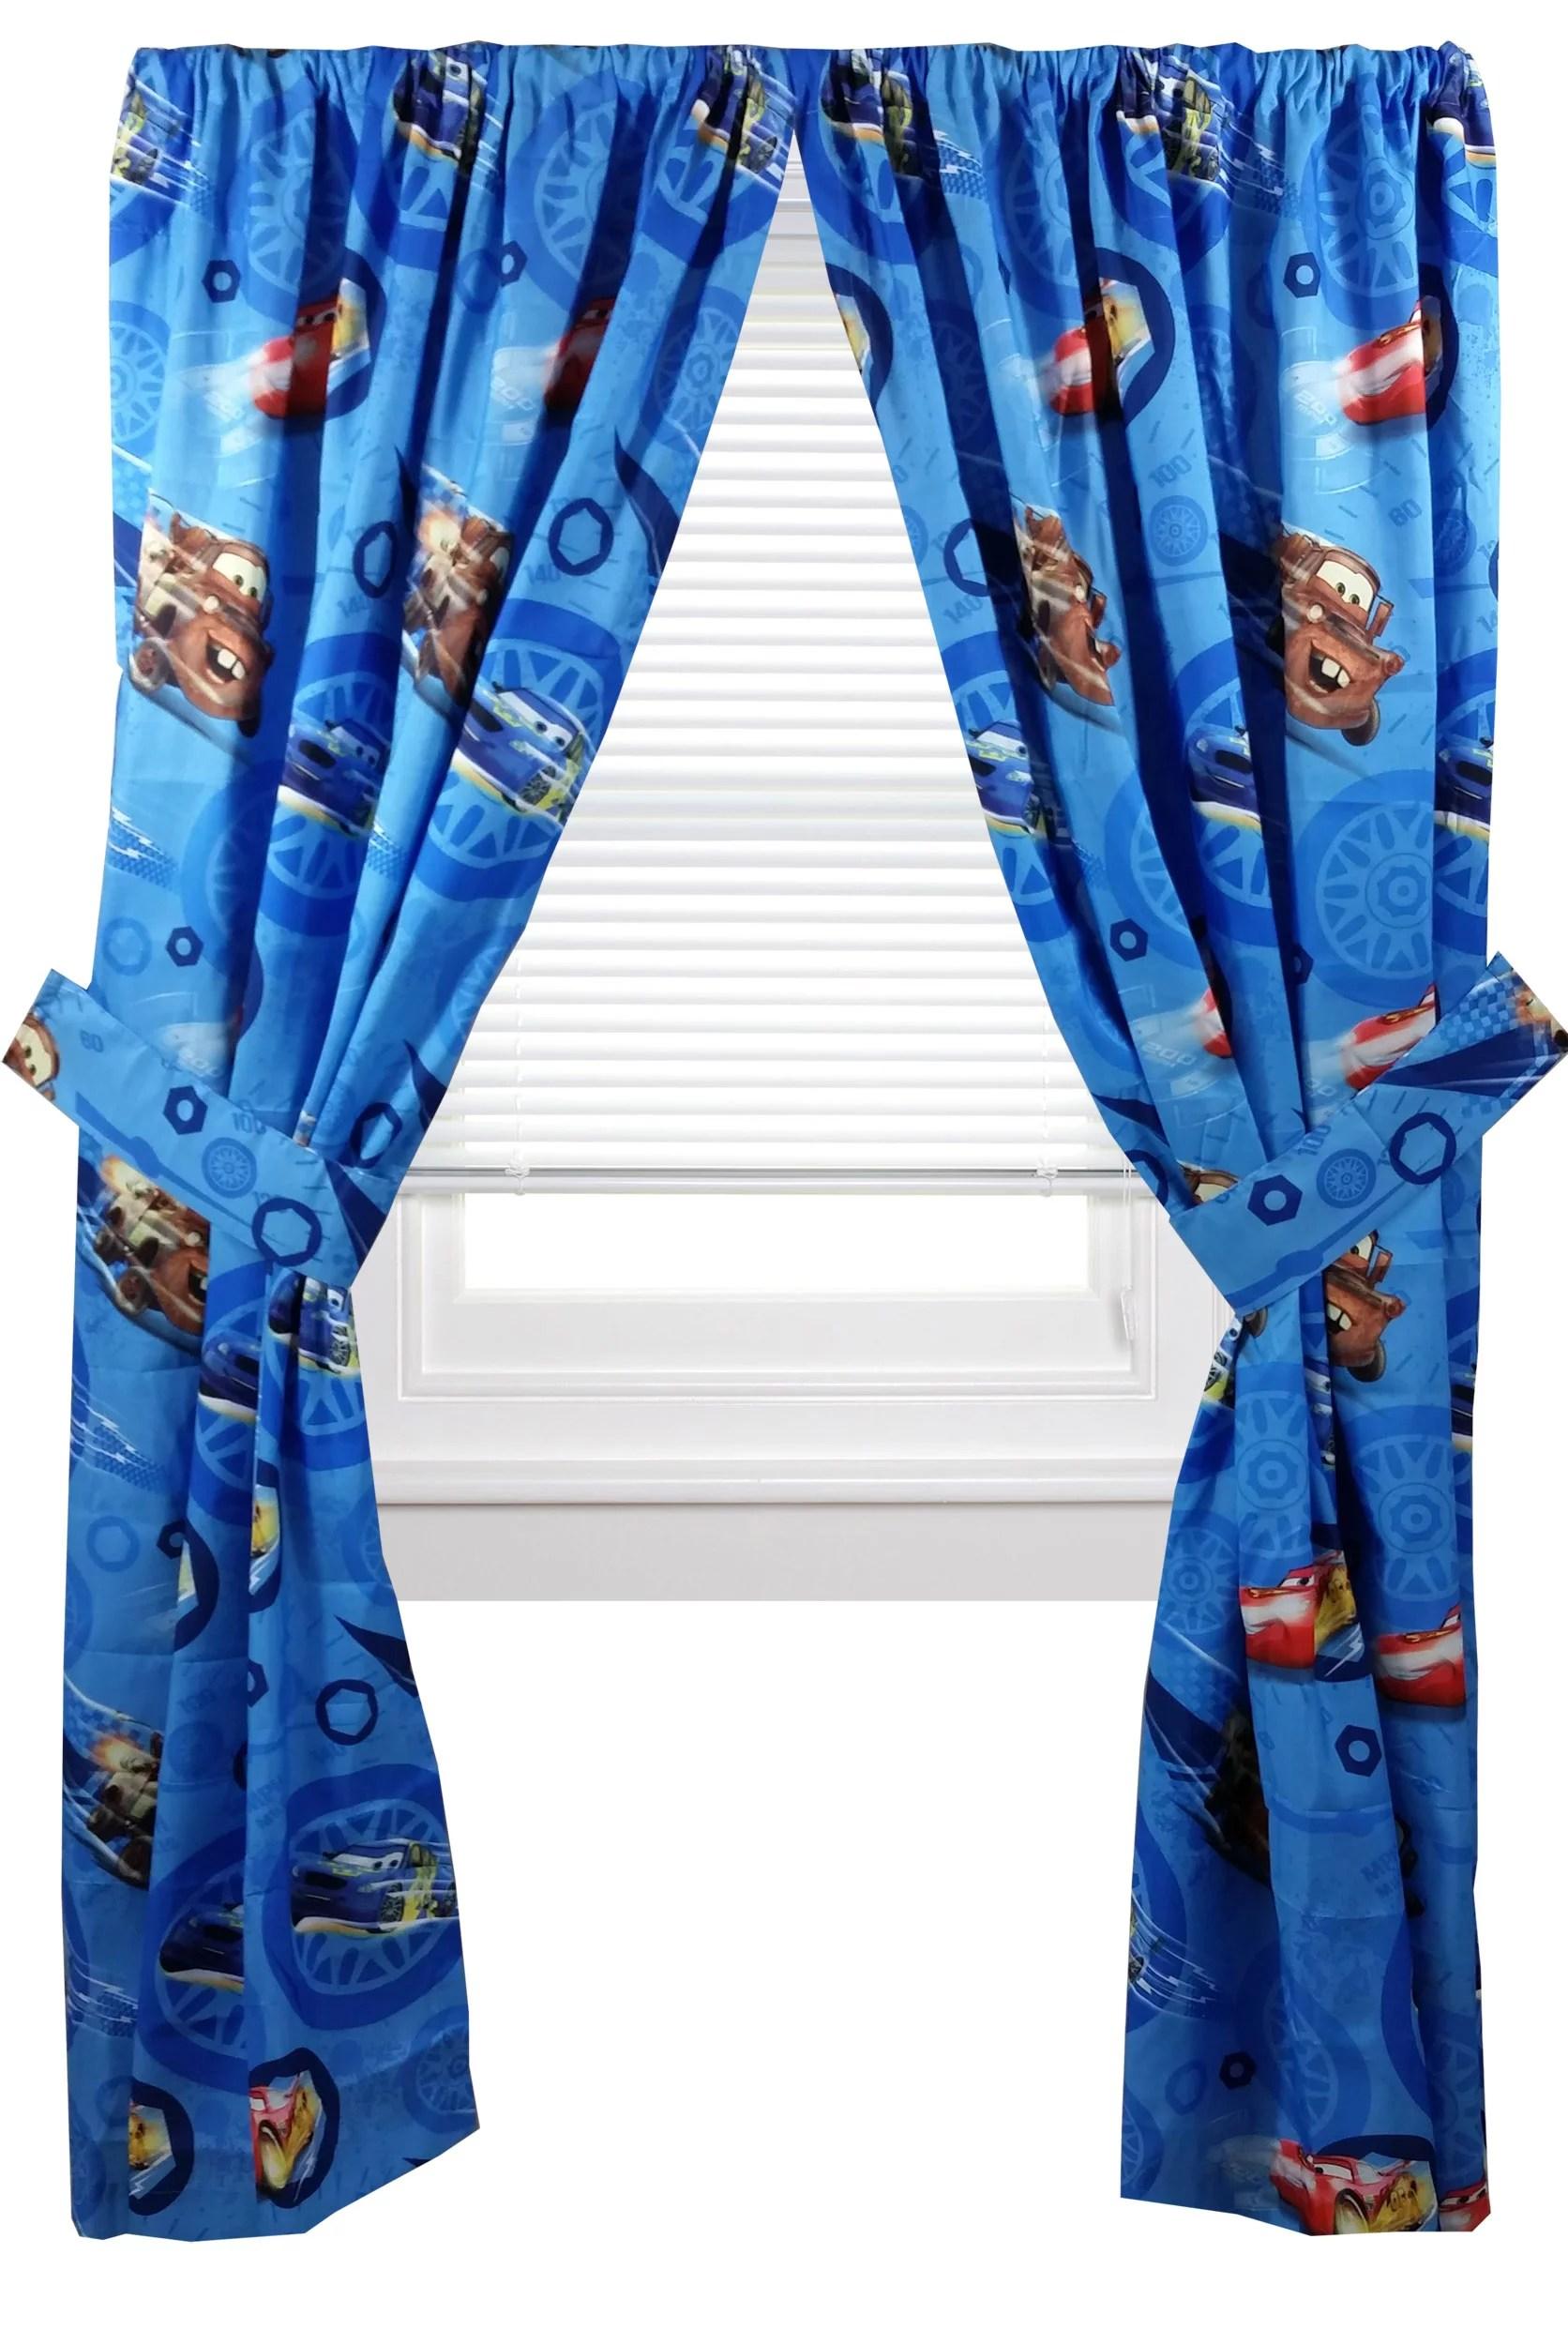 Disney Cars Boys Bedroom Curtains Set Of 2 Panels & Tie Backs